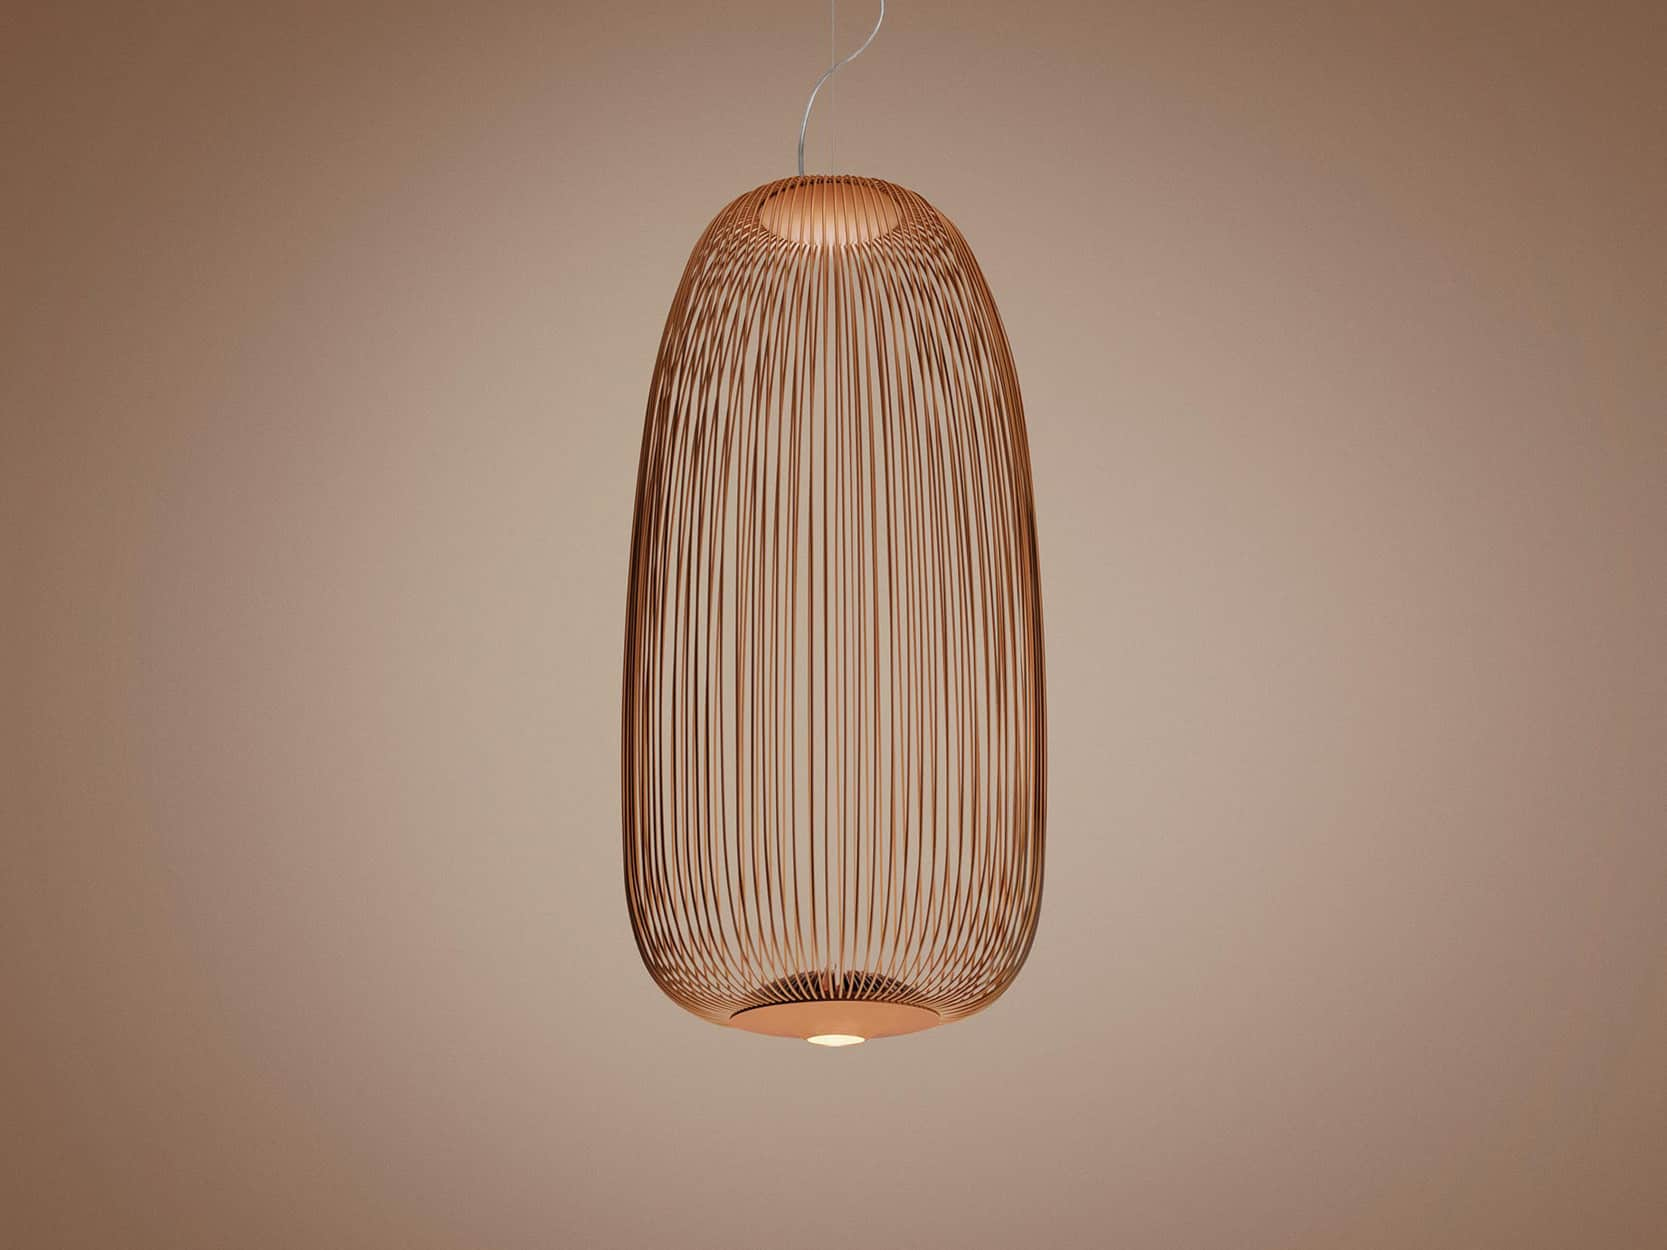 Foscarini hanglamp Spokes1 koper